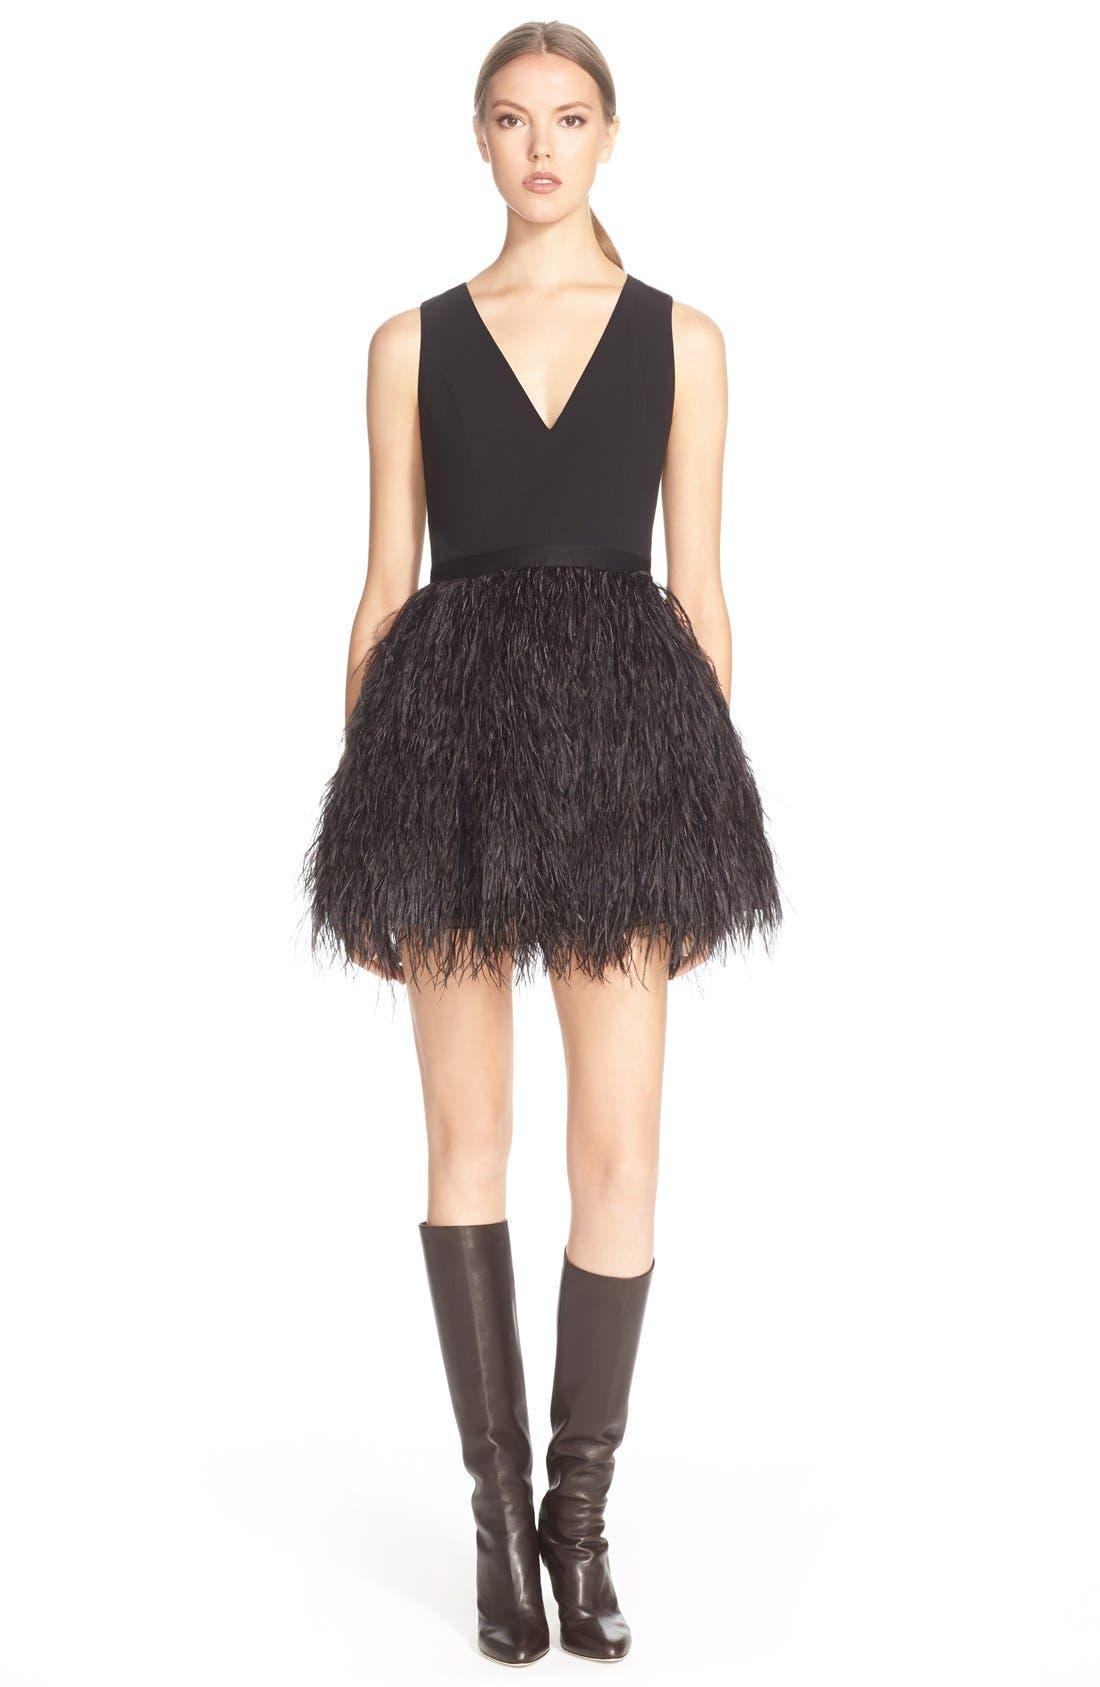 Main Image - Alice+Olivia'Kiara'FeatherSkirt Fit & Flare Dress